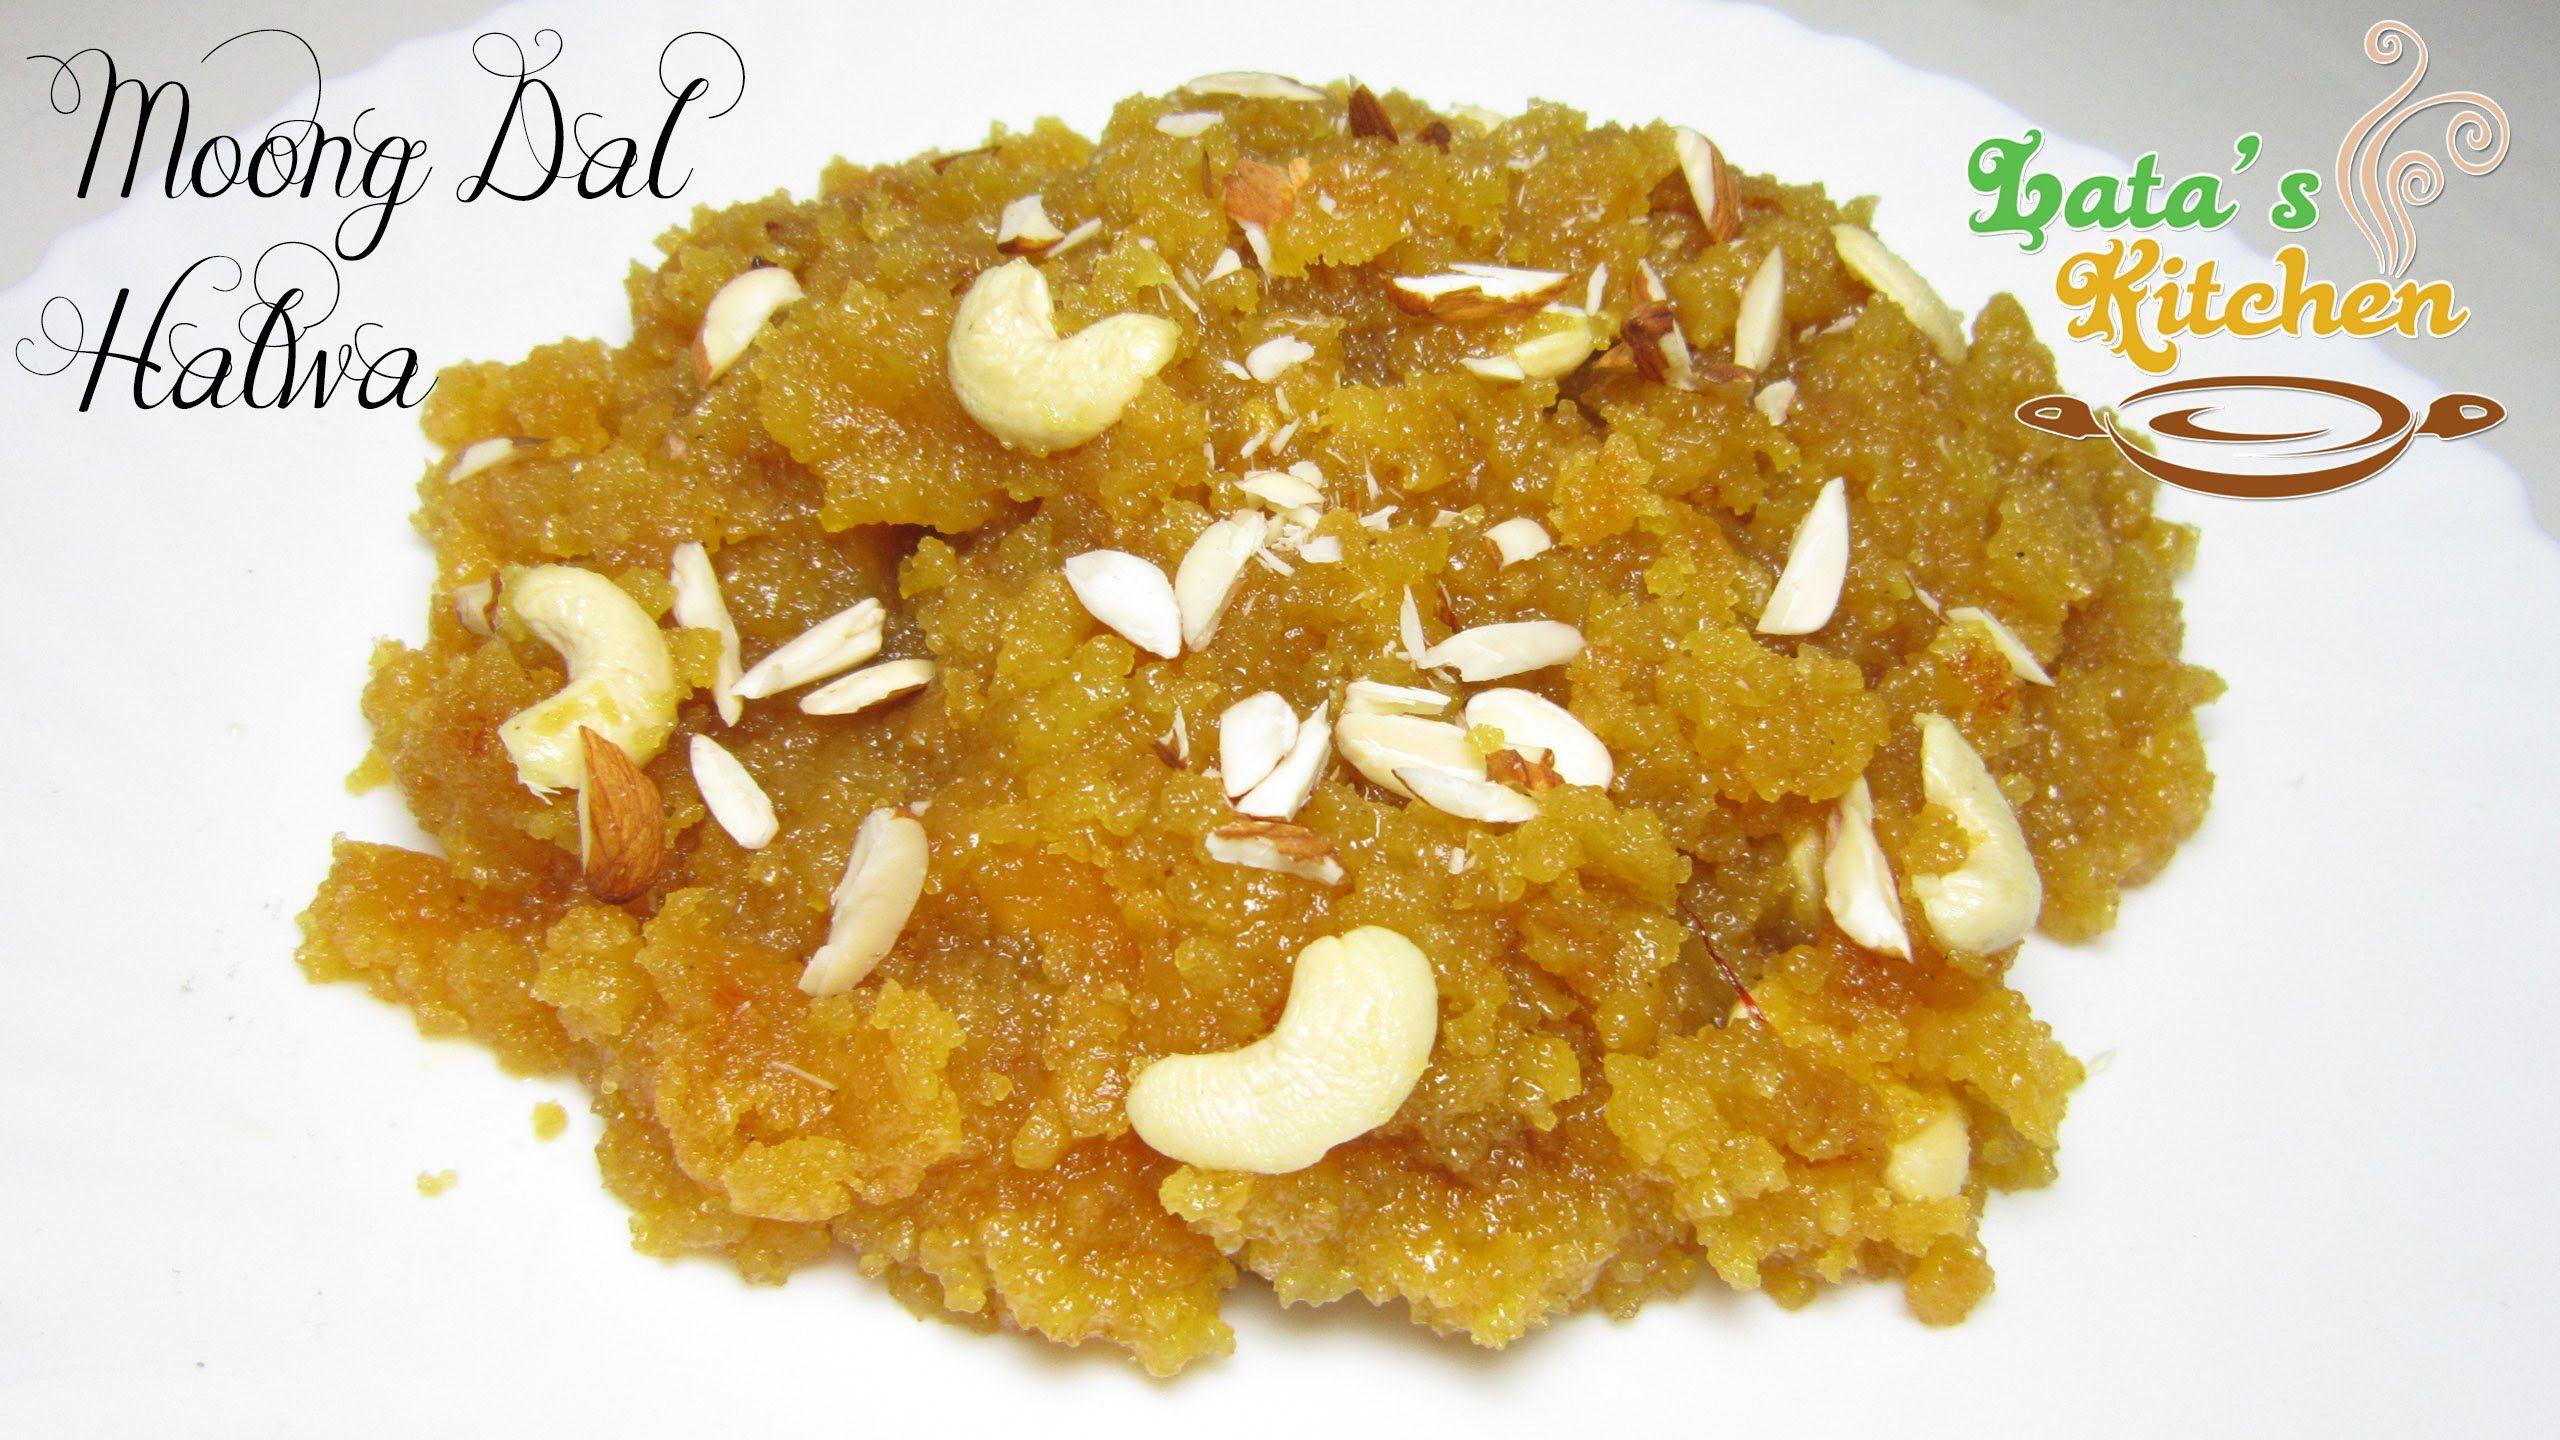 Moong dal halwa recipe video indian dessert recipe in hindi with moong dal halwa recipe video indian dessert recipe in hindi with engli forumfinder Choice Image